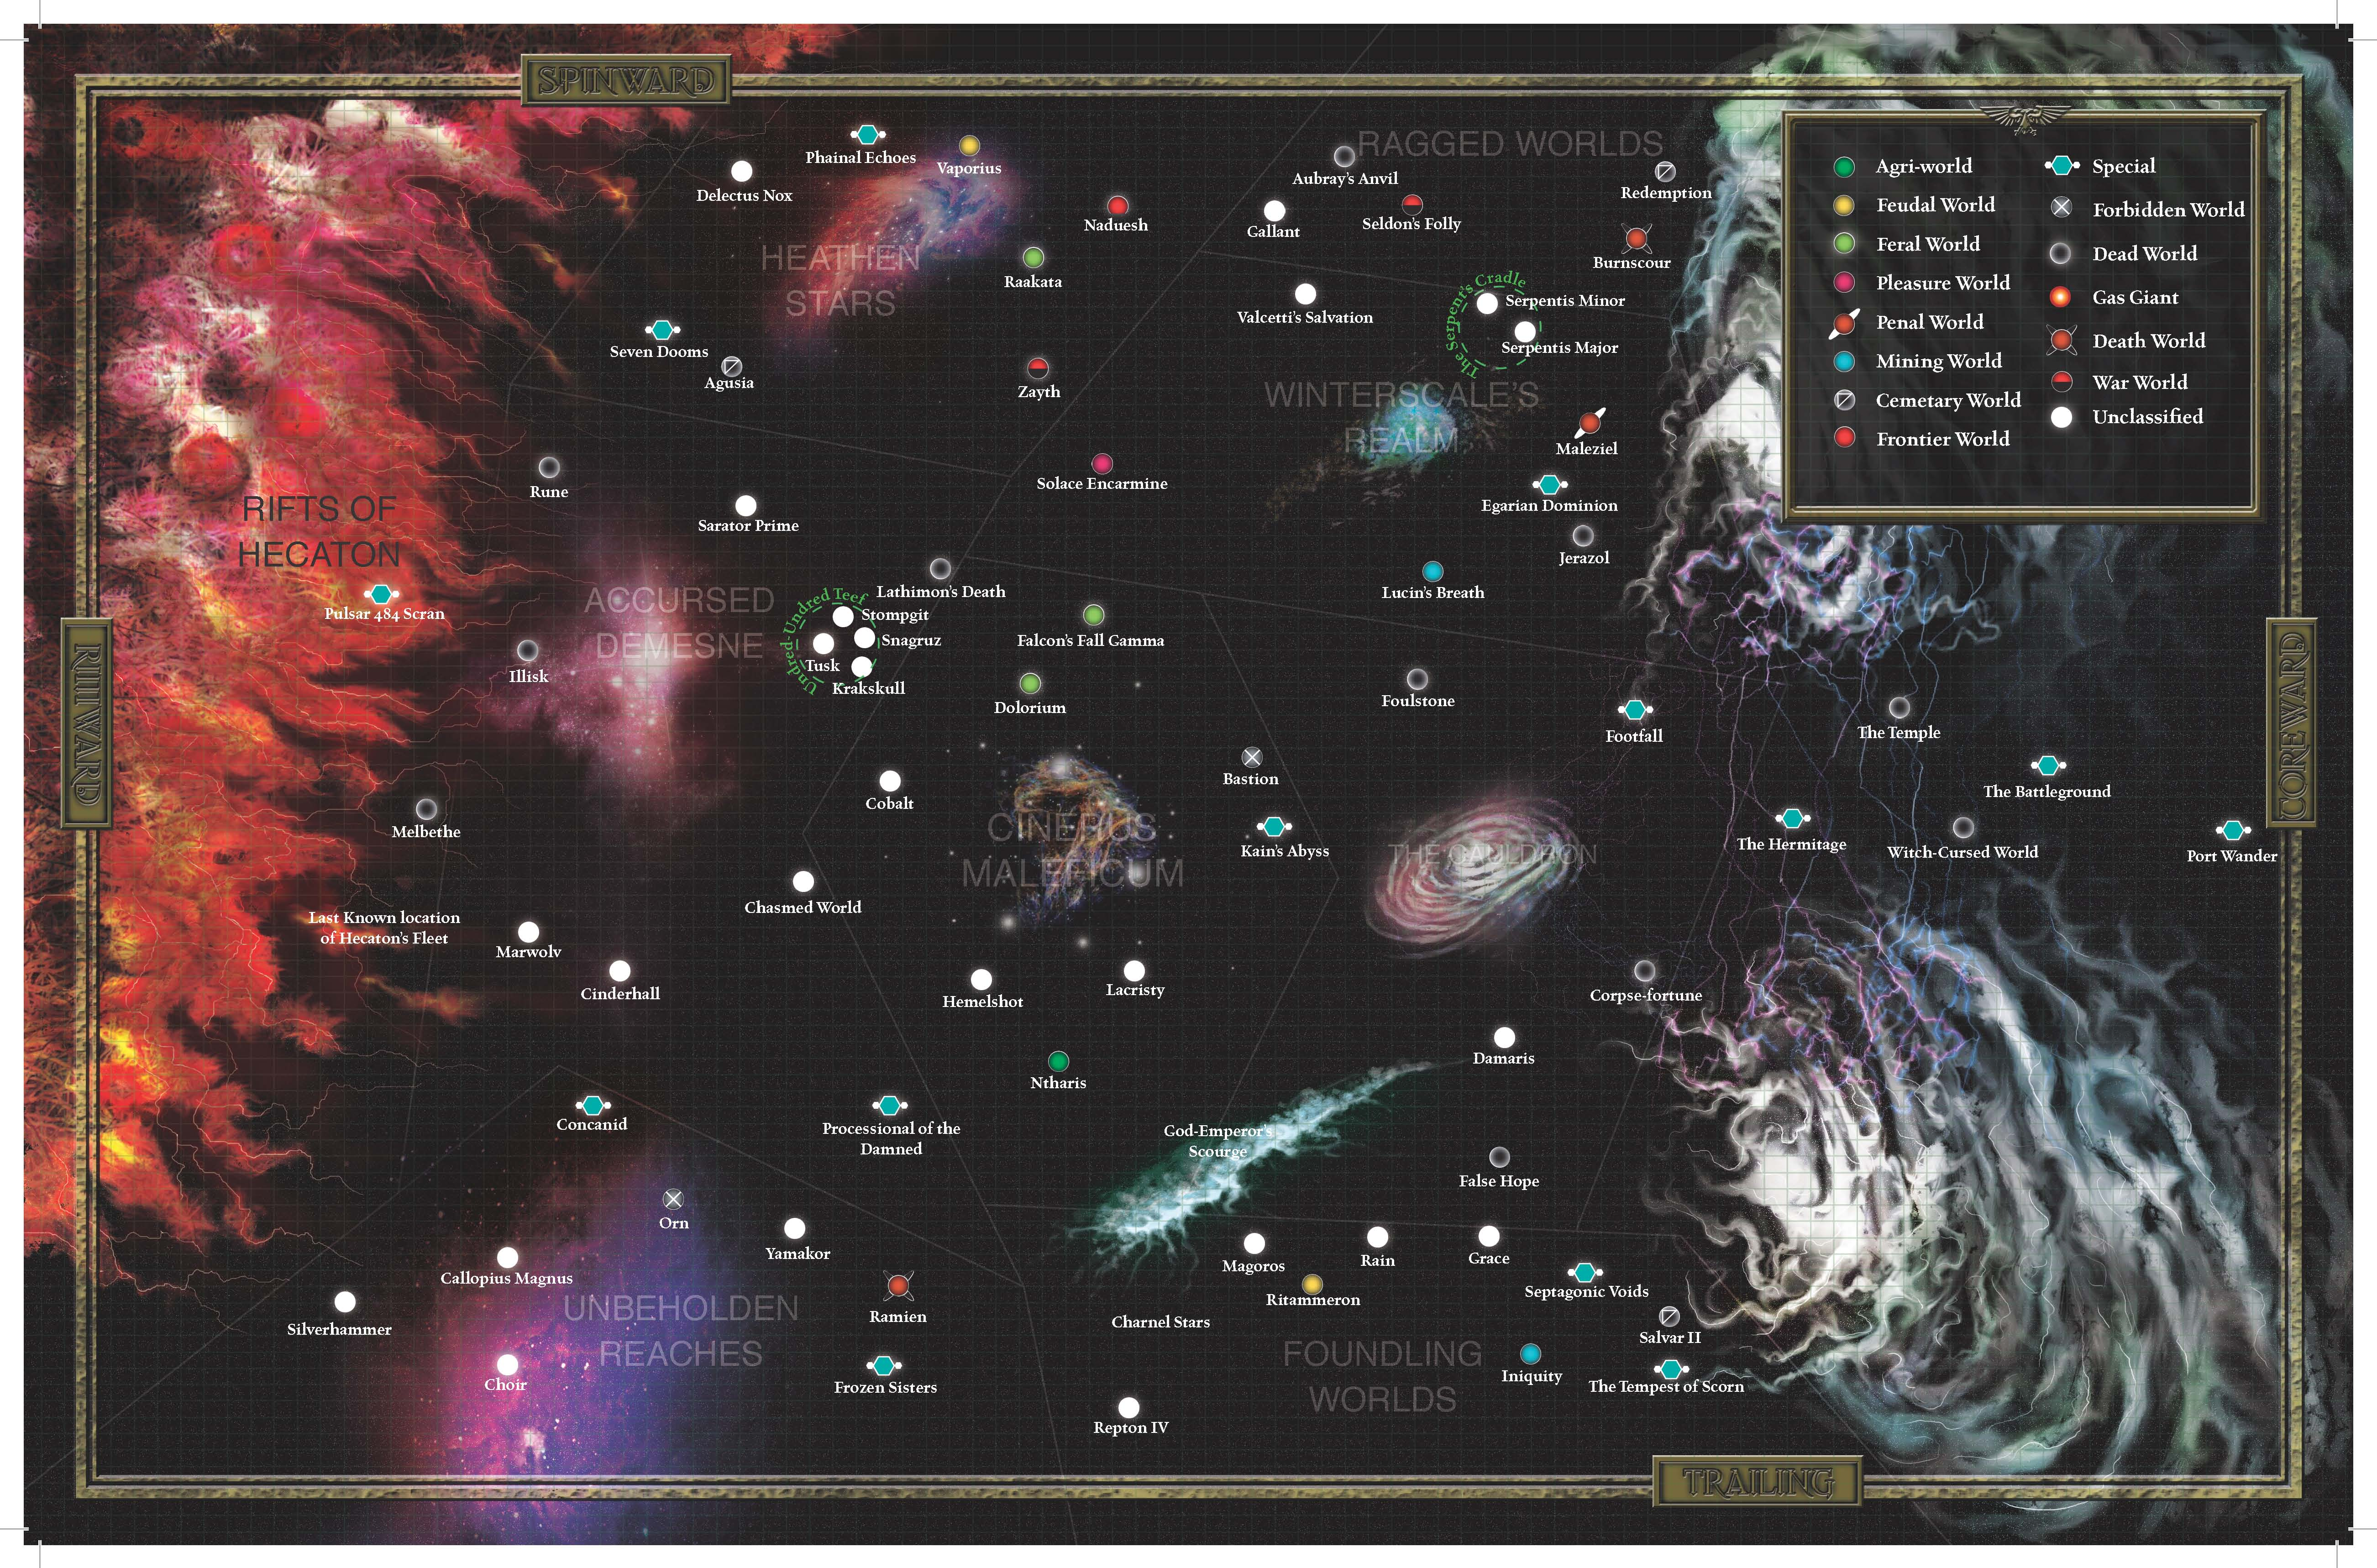 https://images-cdn.fantasyflightgames.com/ffg_content/rogue-trader/support/images/Koronus%20Expanse%20Map%20(jpg).jpg